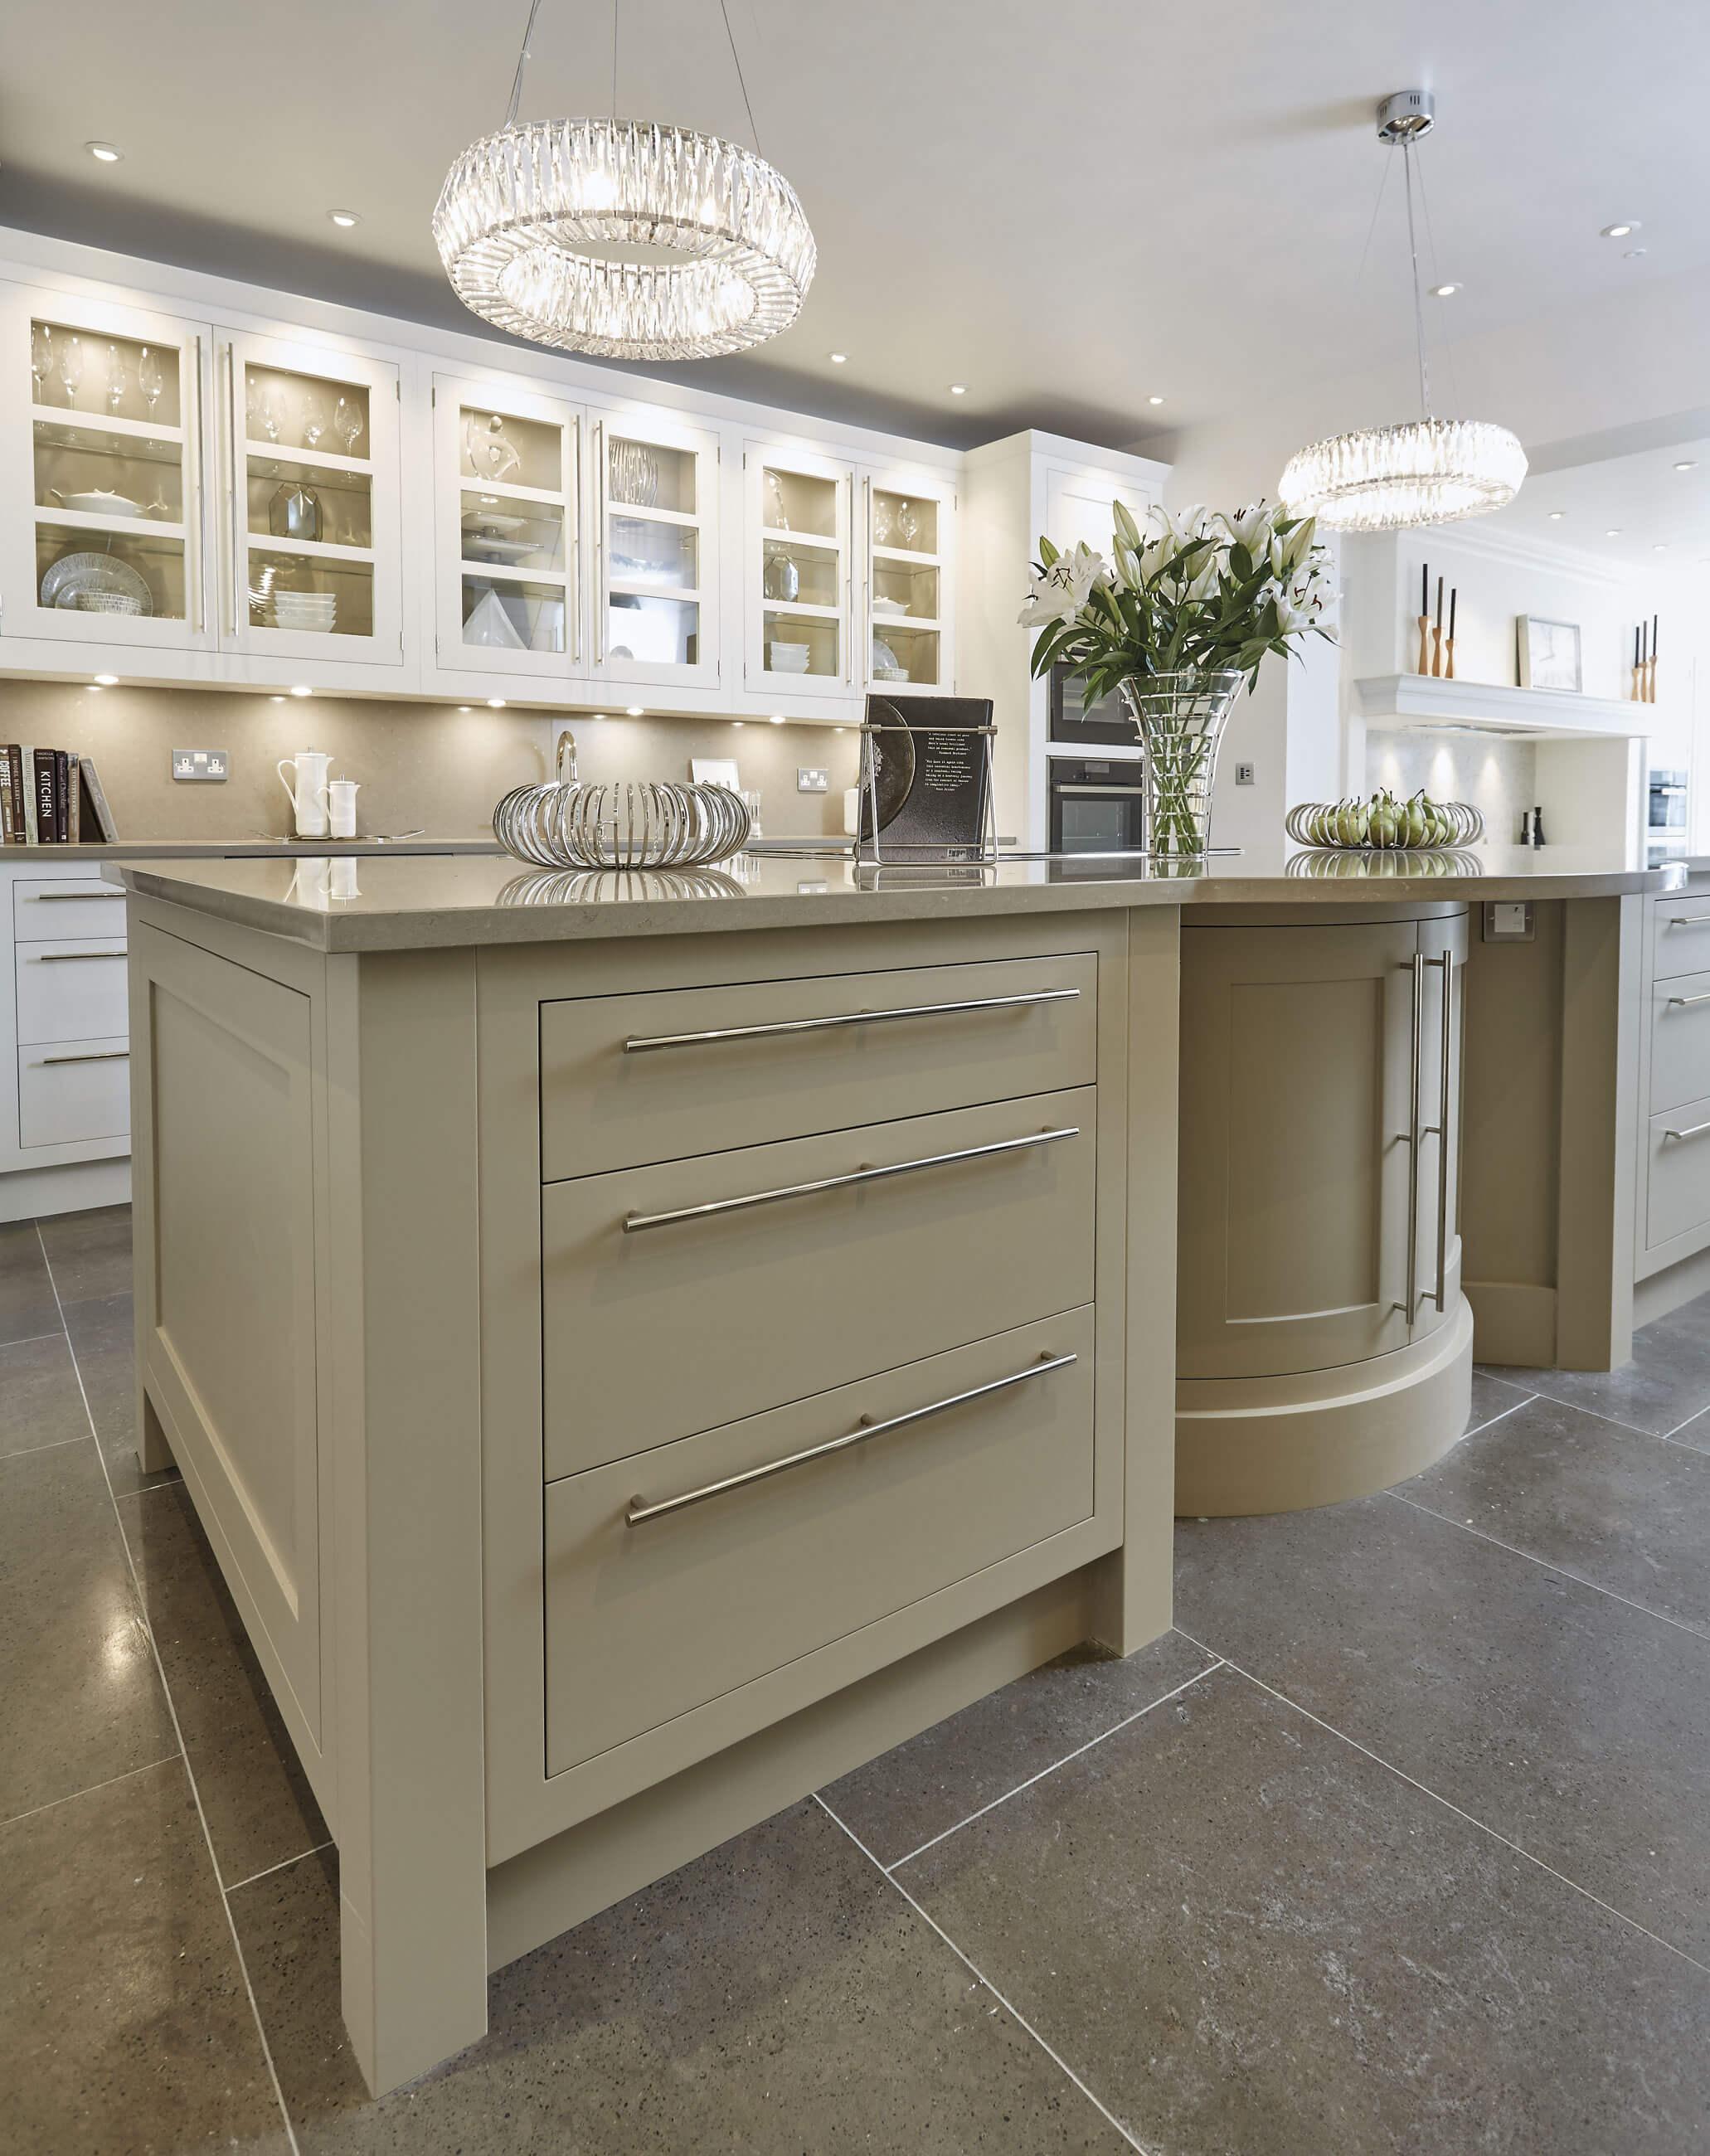 Cream and White Kitchen   Tom Howley